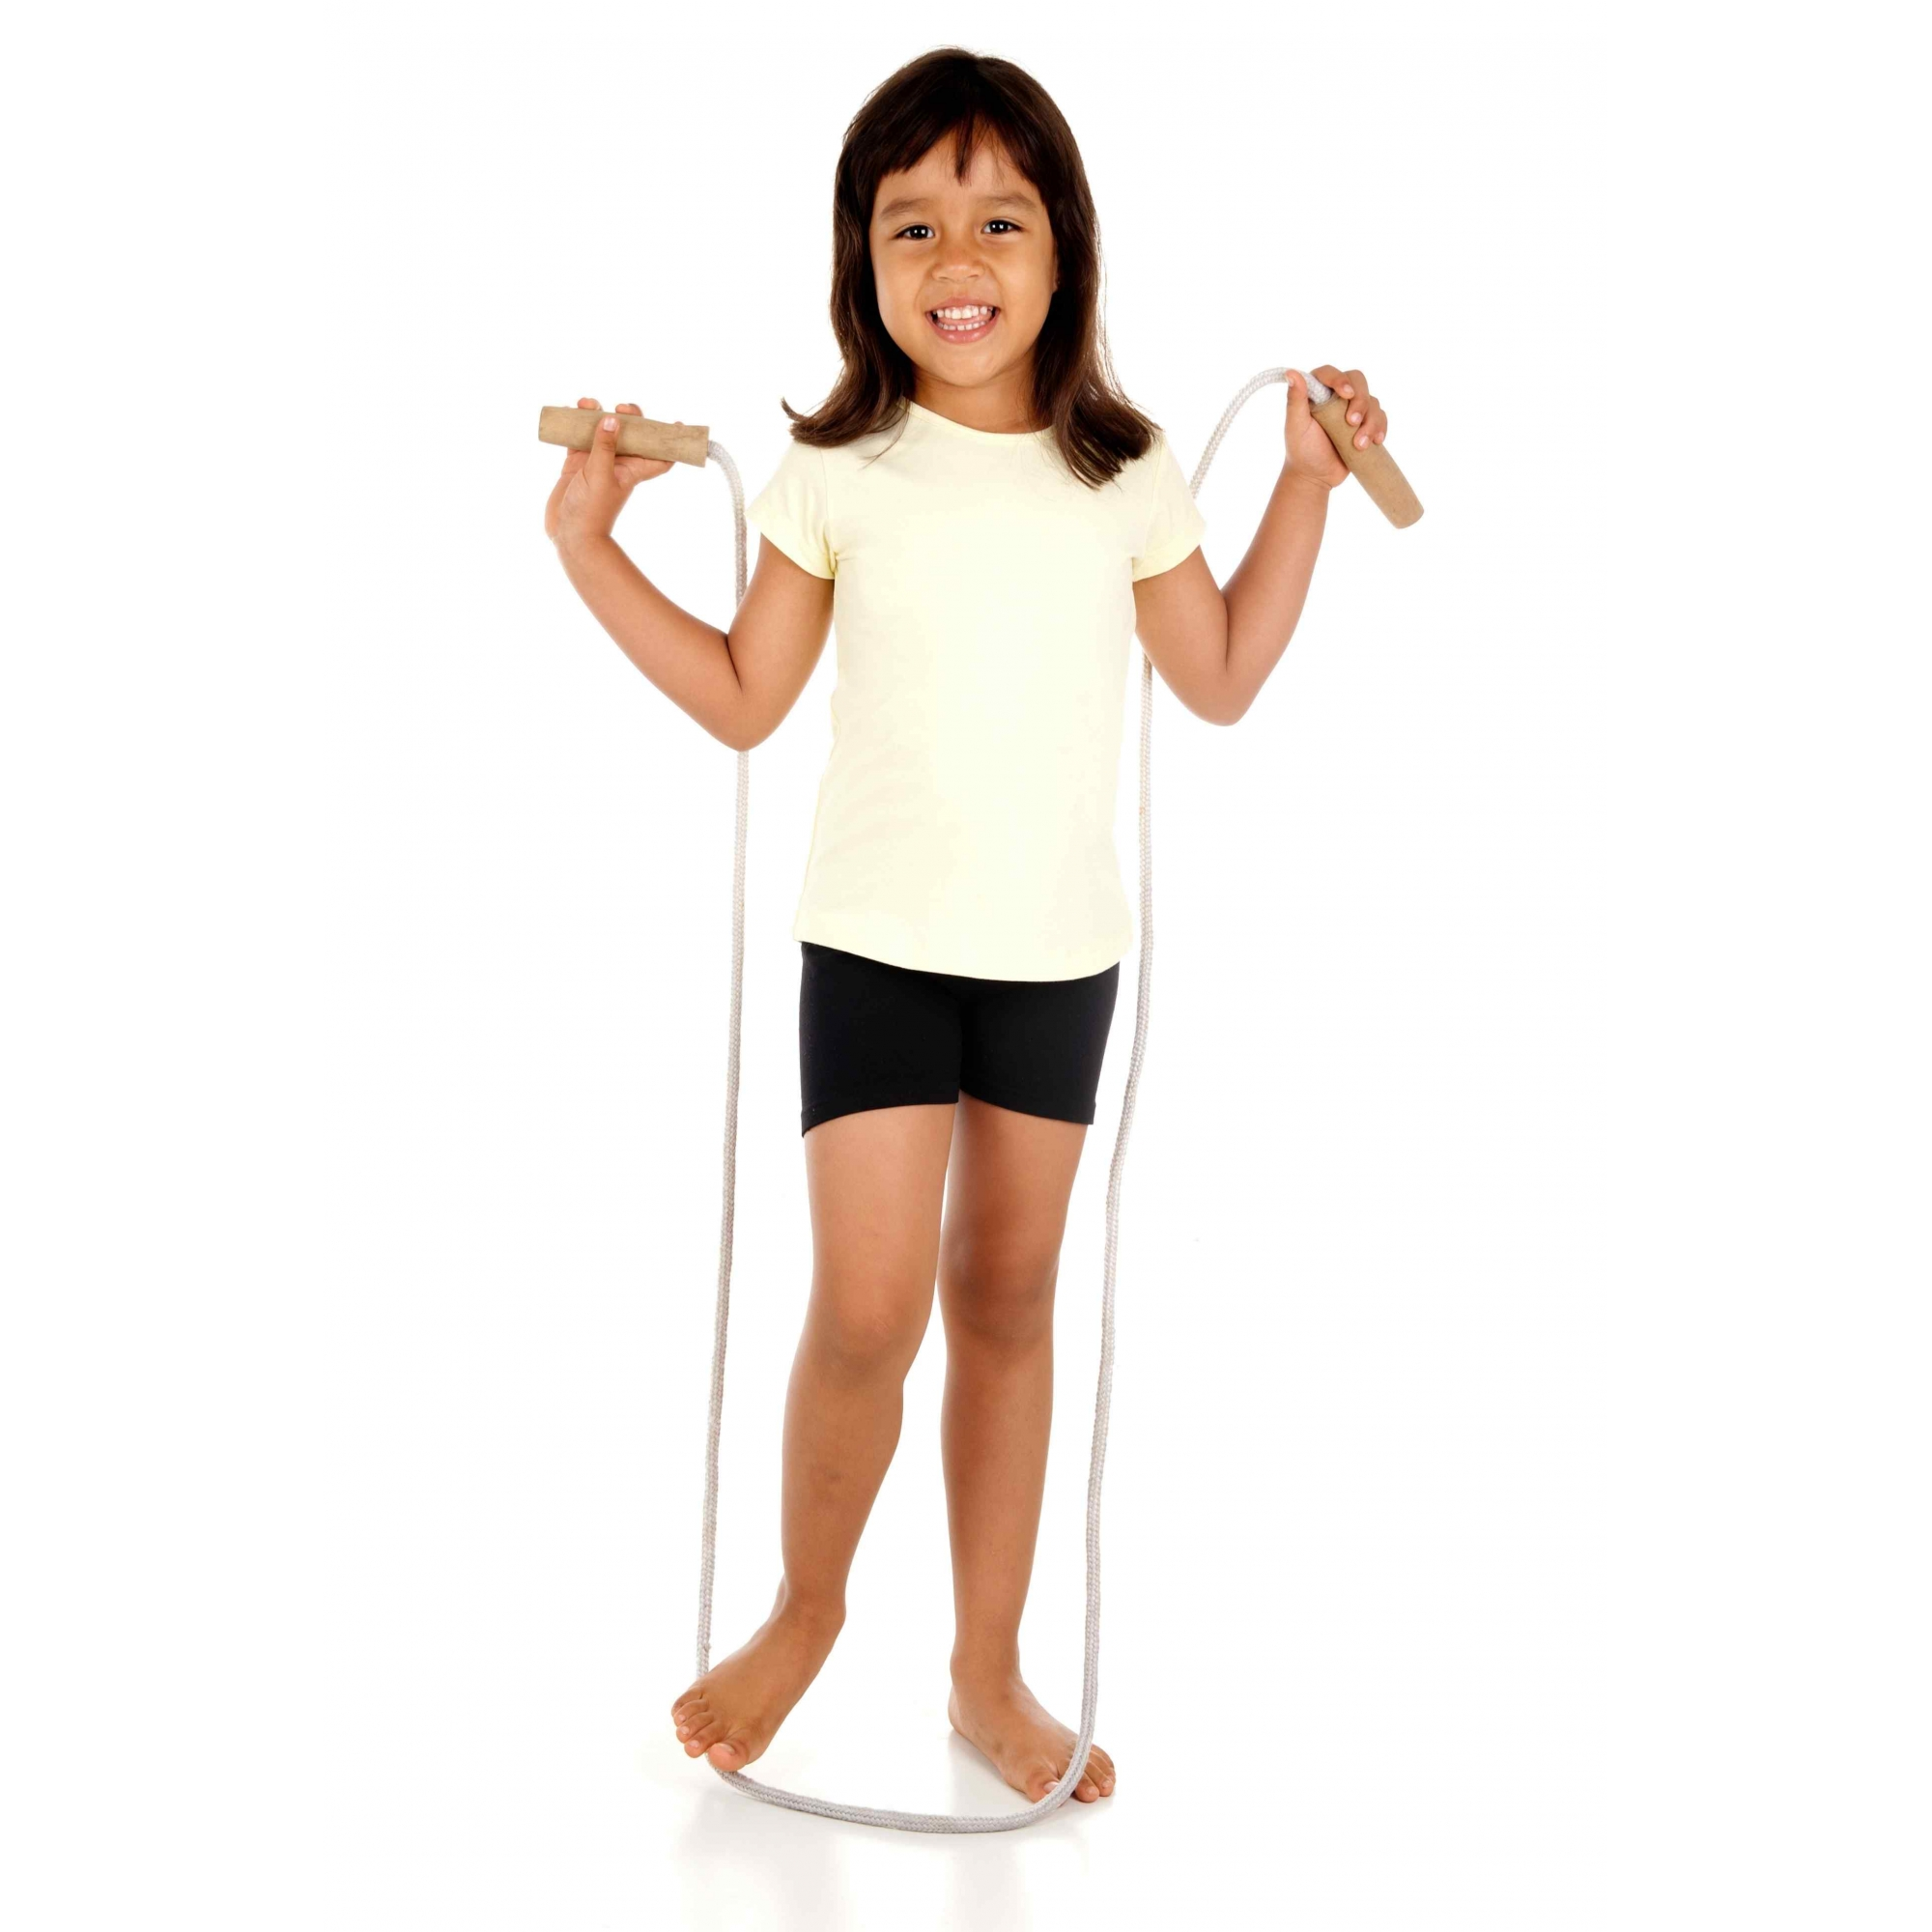 30 Corda De Pular Infantil 1,80m Nylon Lembrancinha Prenda